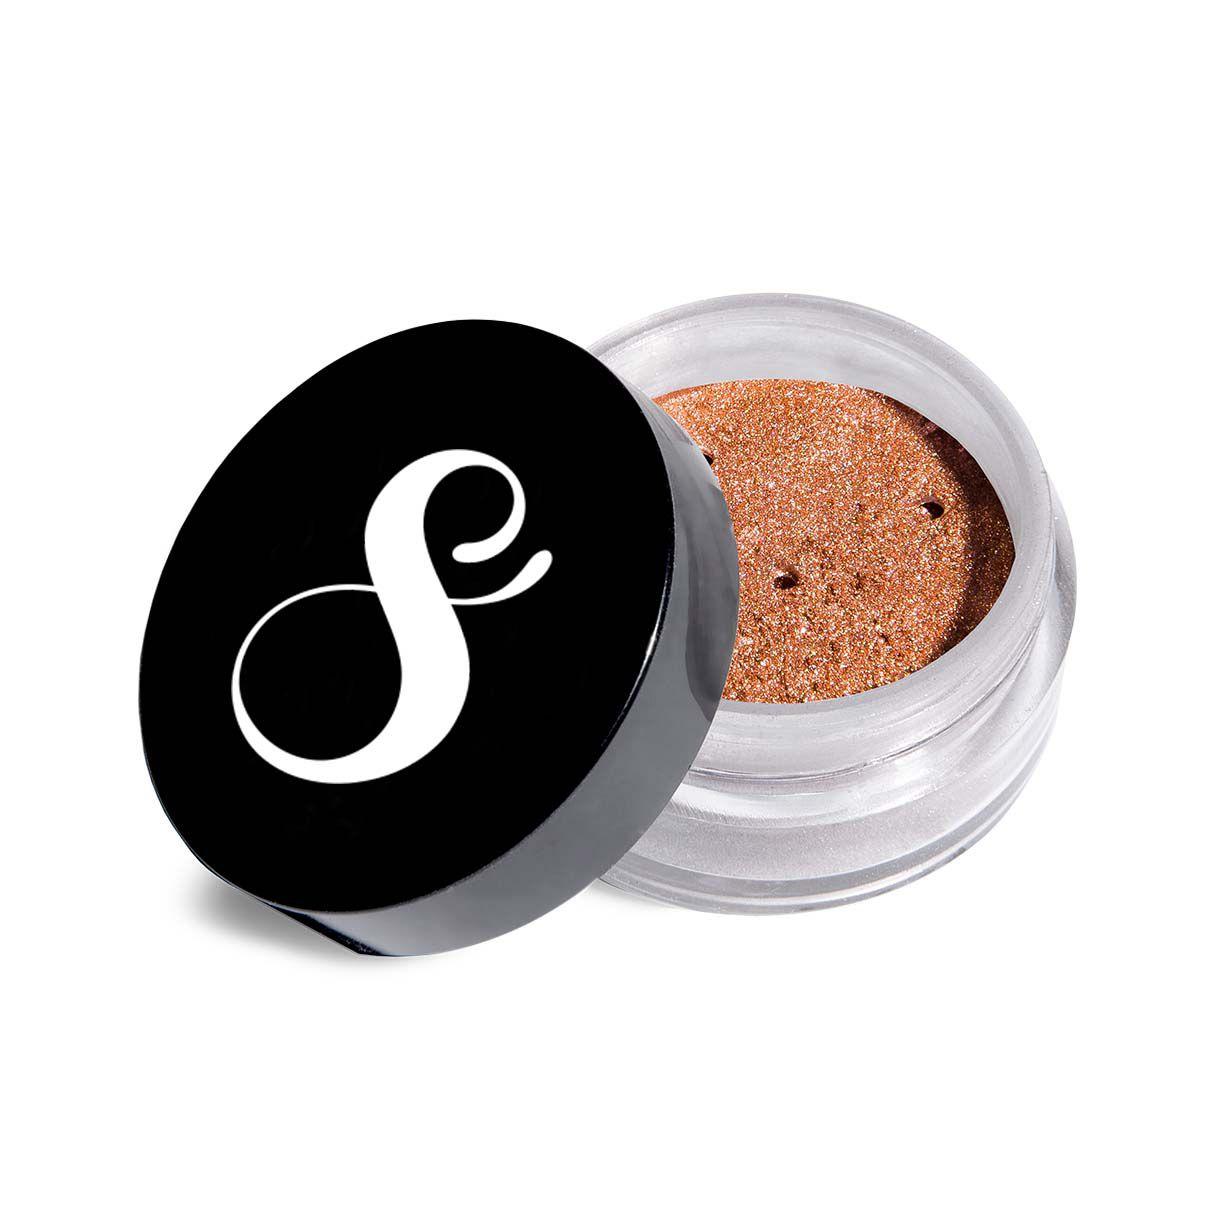 Asa de Borboleta Pigmento Suelen Makeup Paris  - SUELEN MAKEUP